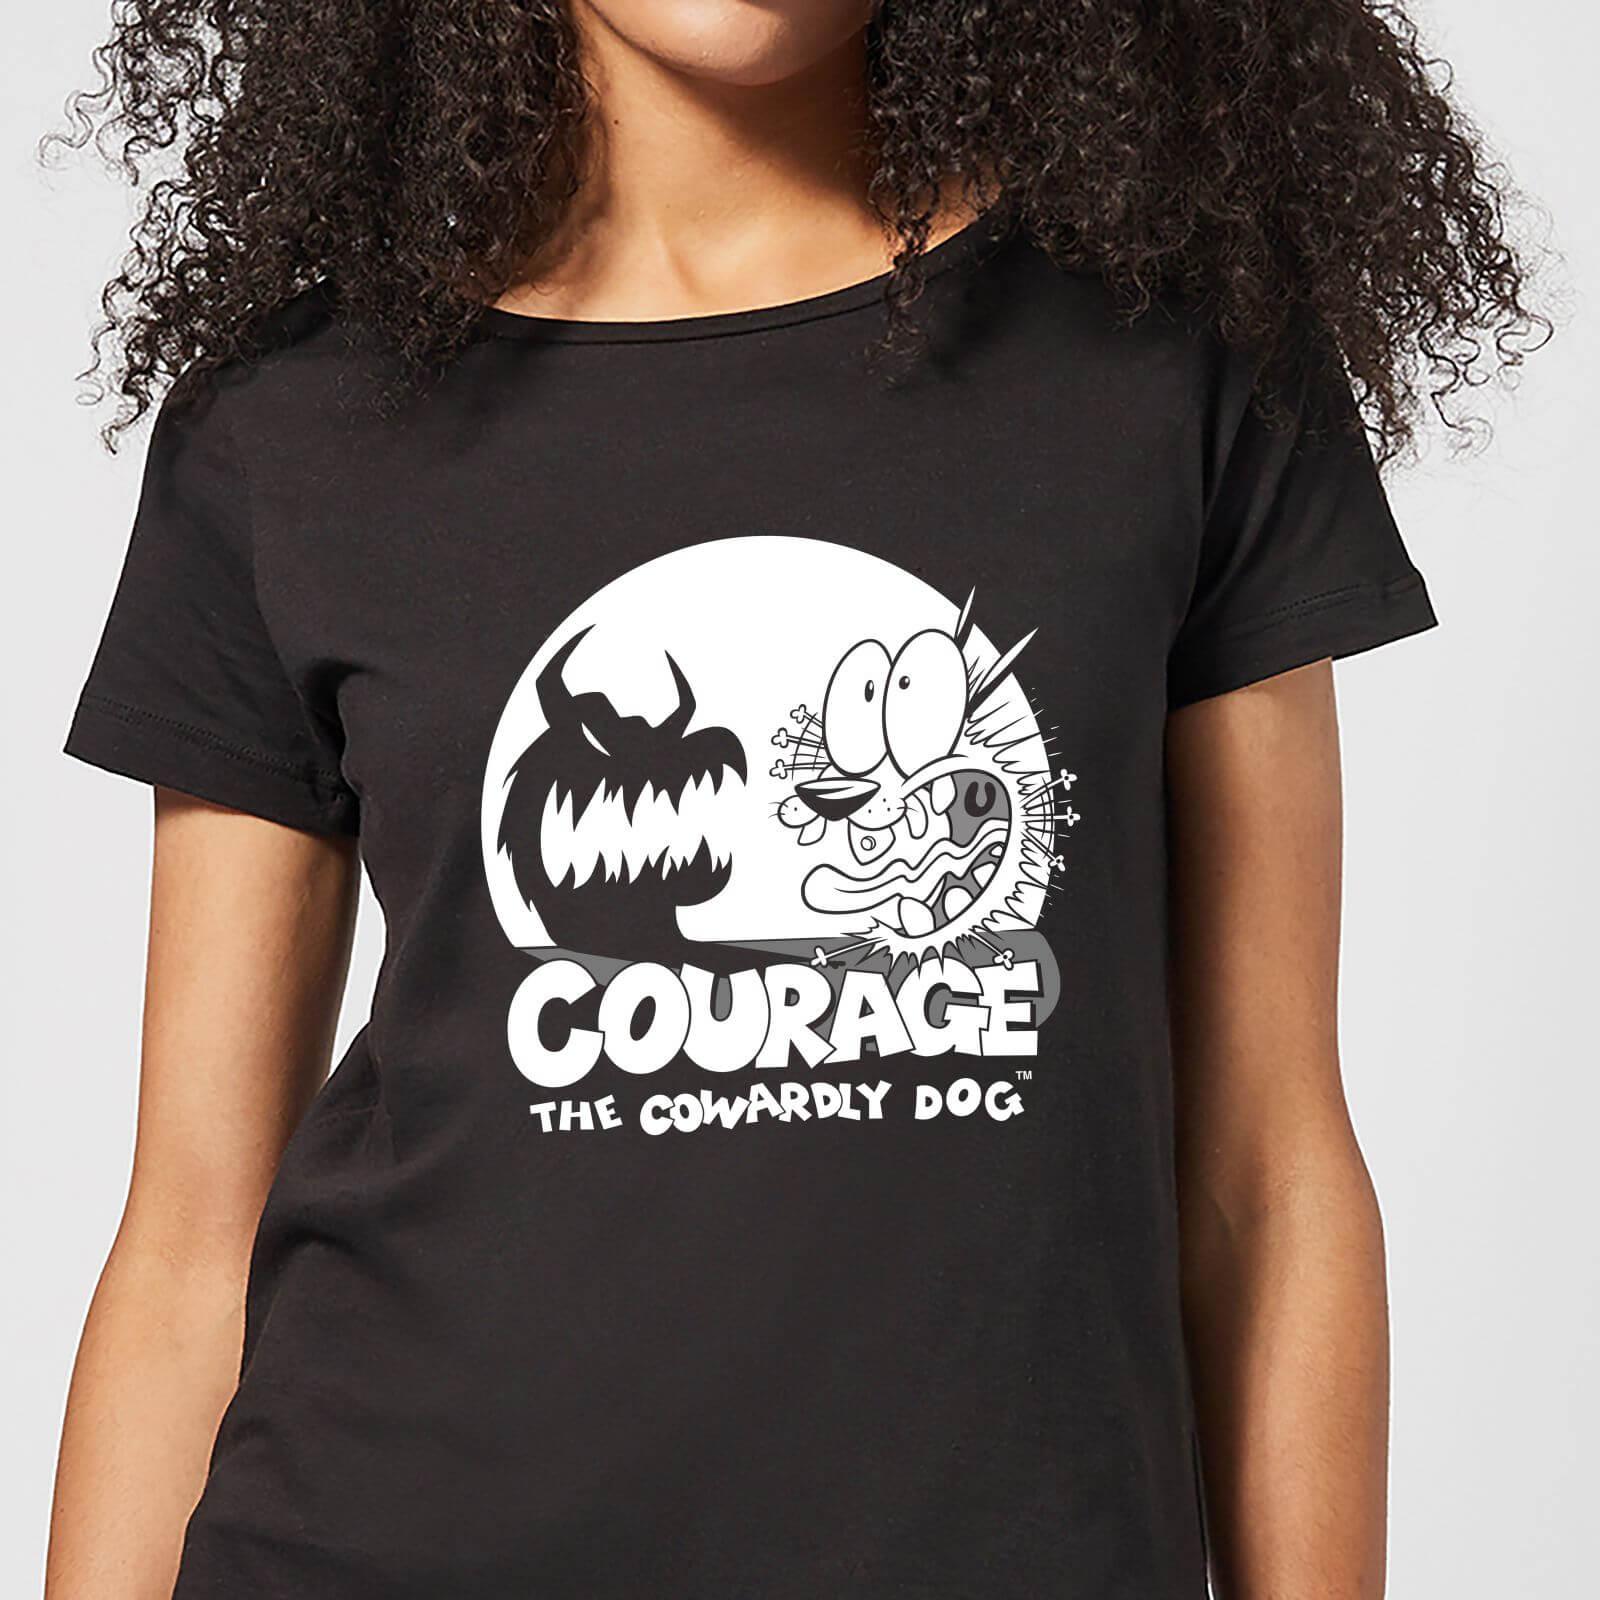 Cartoon Network Courage The Cowardly Dog Spotlight Women's T-Shirt - Black - XXL